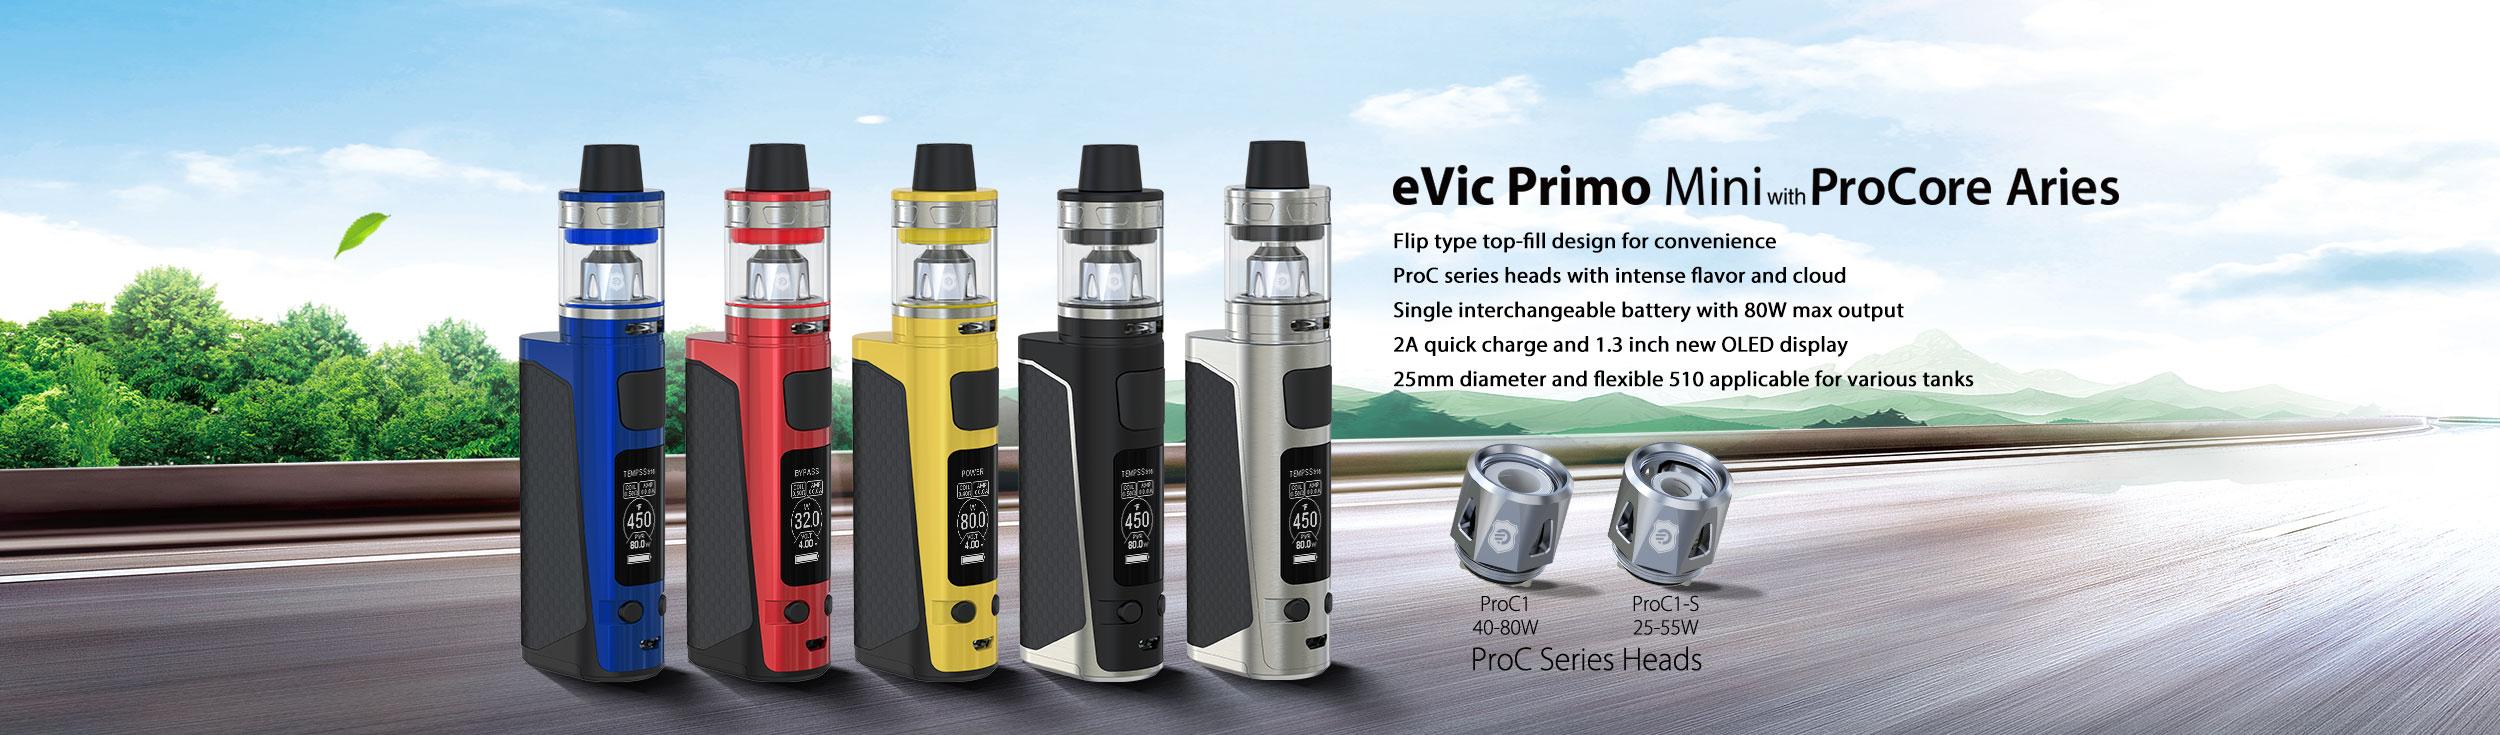 [Image: eVic_Primo_Mini_poster1.jpg]